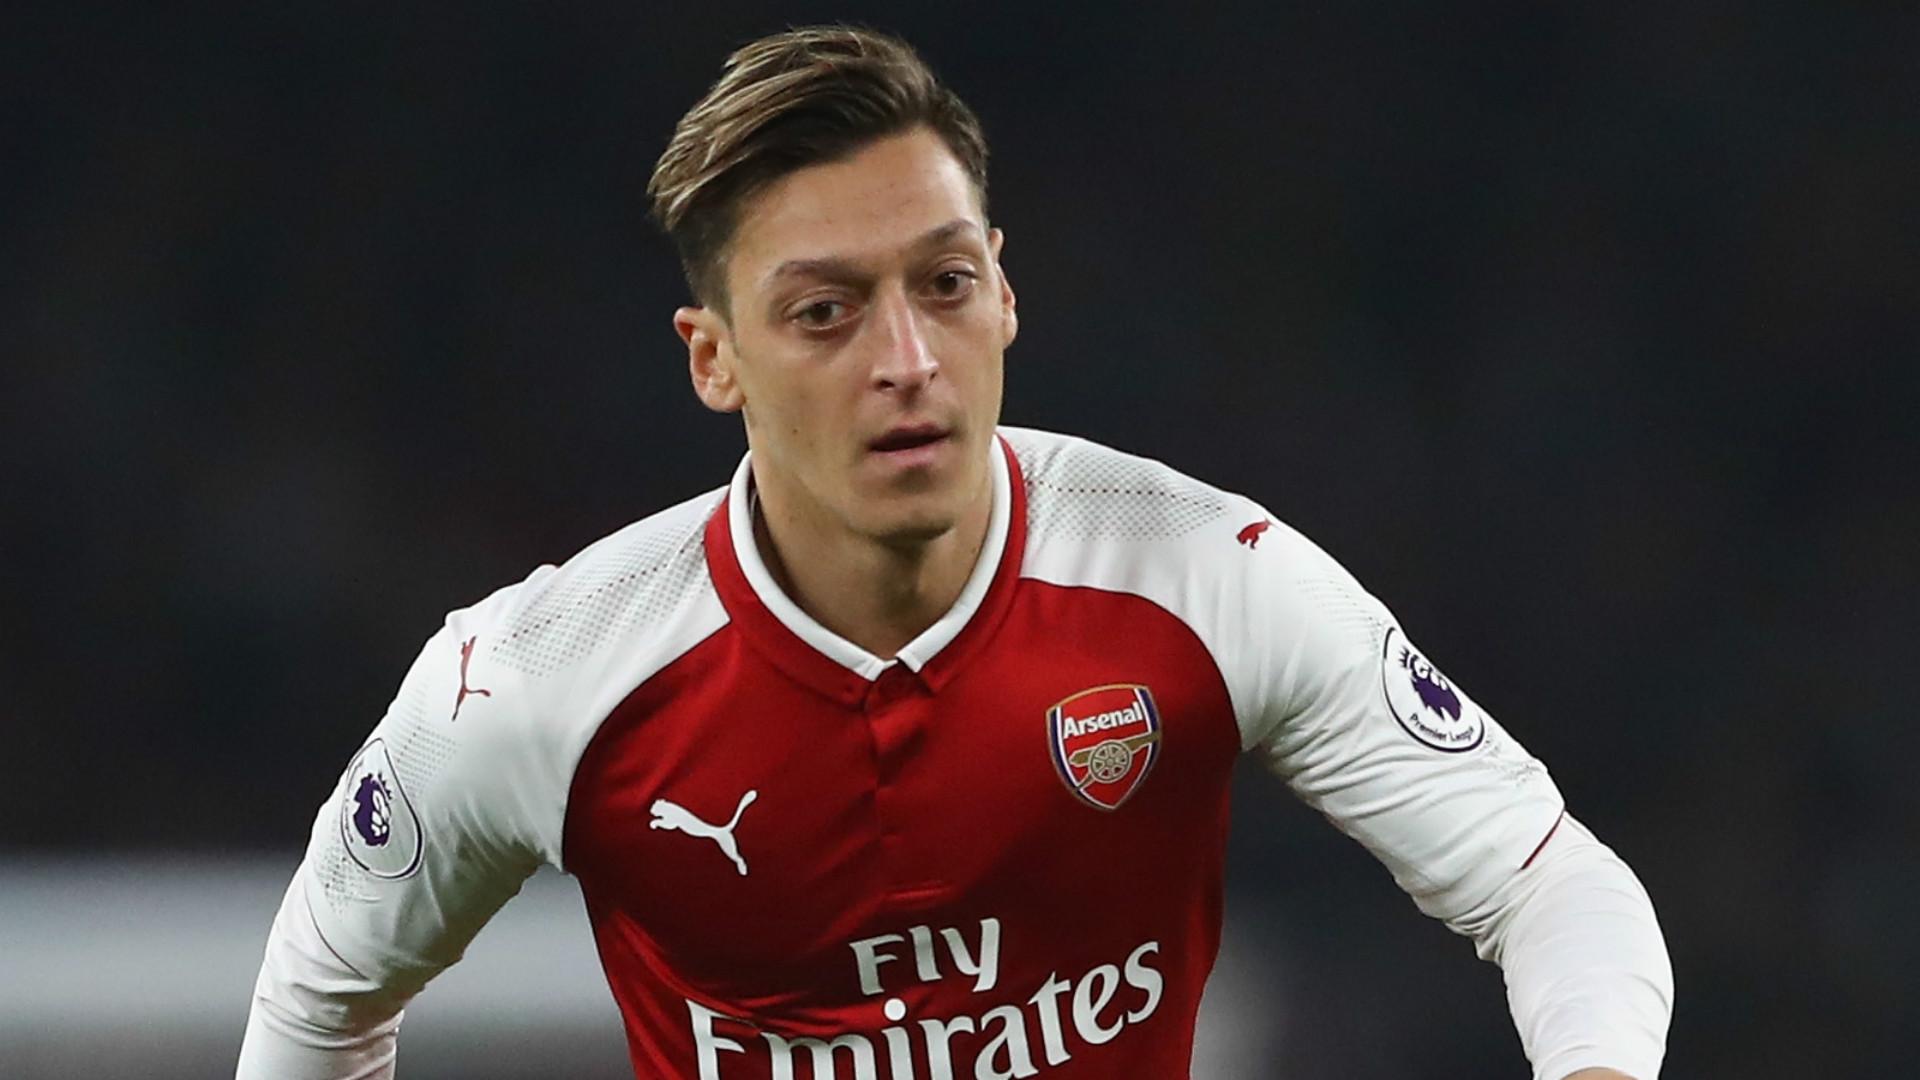 Kabar Buruk Mesut Ozil Di Coret Arsenal dari Skuad Liga Europa